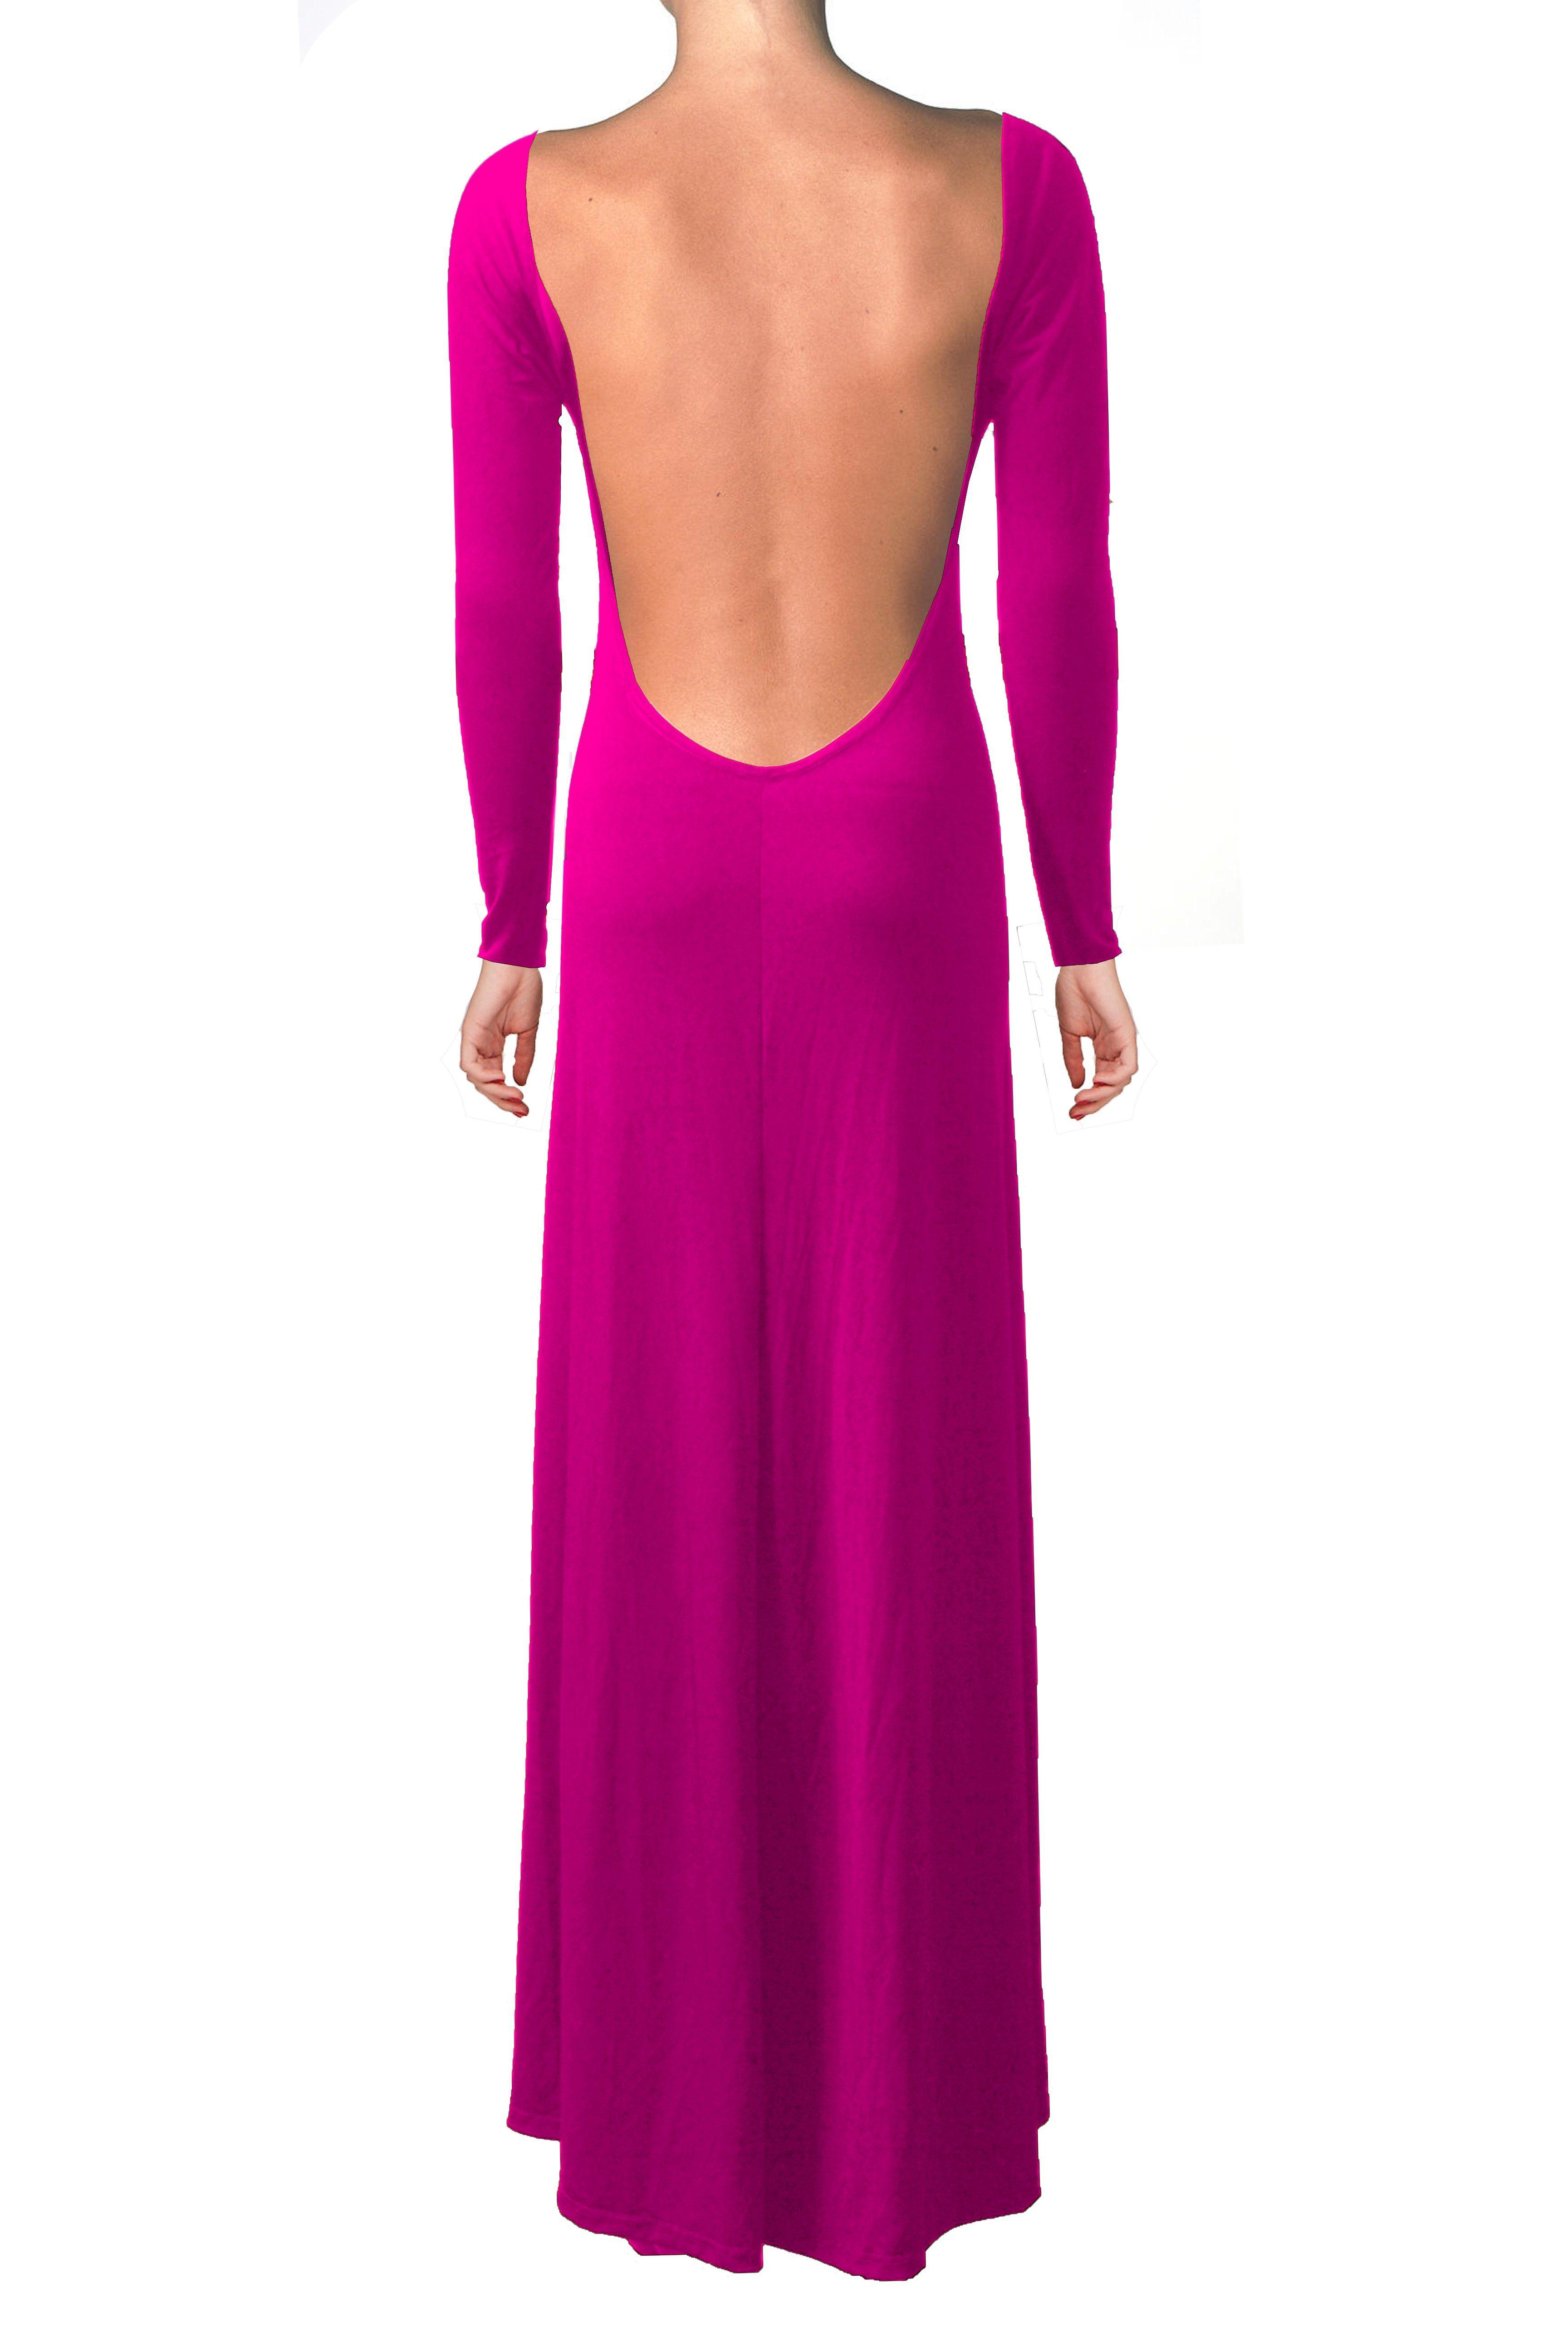 Hot pink dress bridesmaid backless dress long sleeve prom dress open